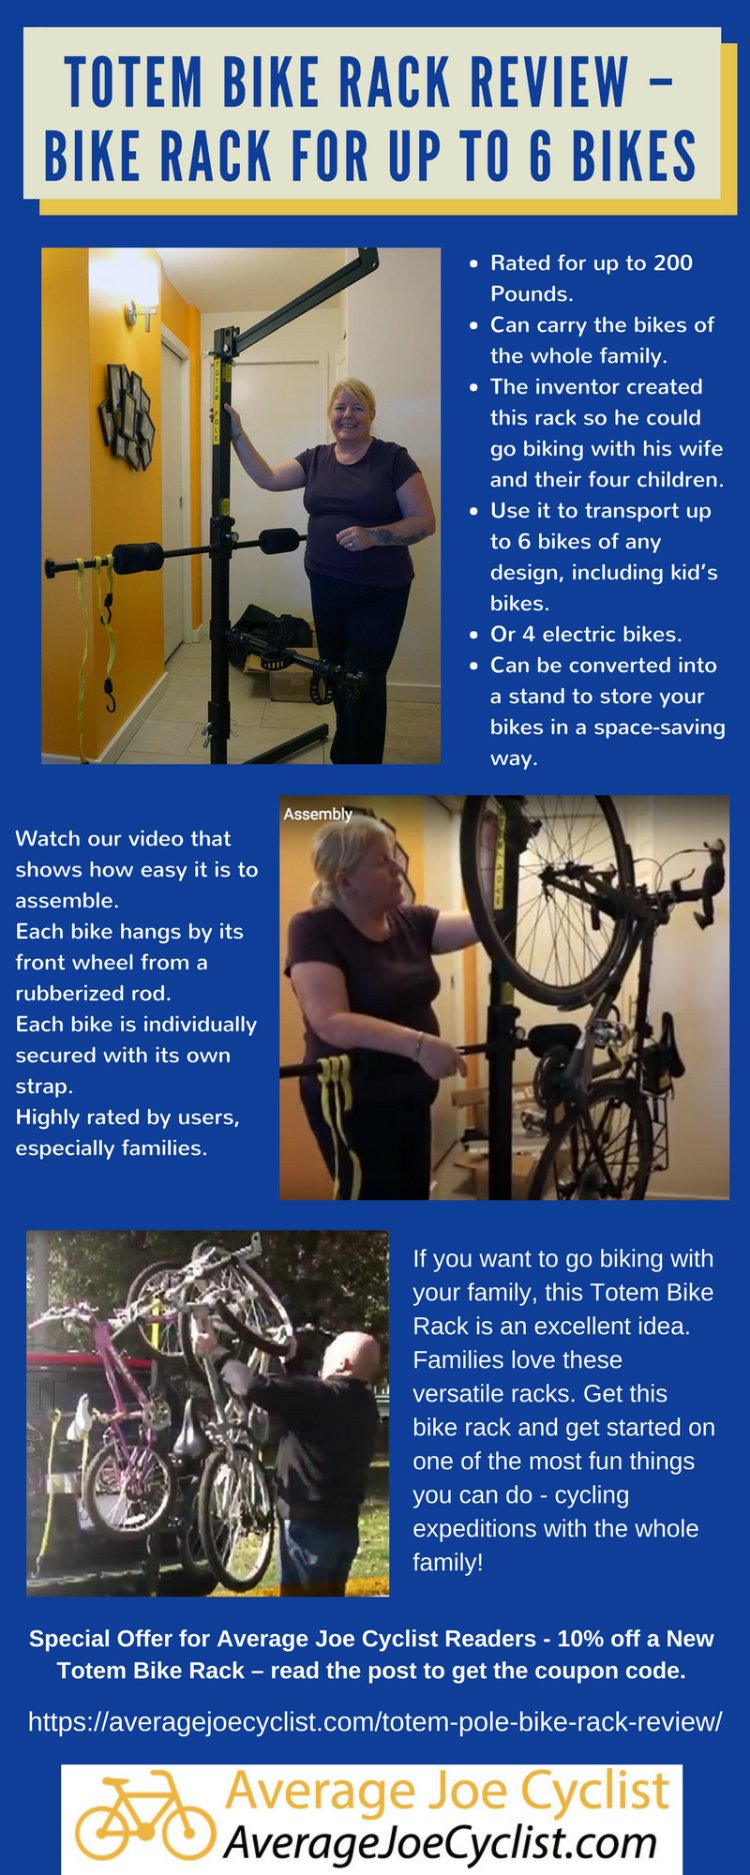 Totem Bike Rack Review - Transport up to 6 bikes